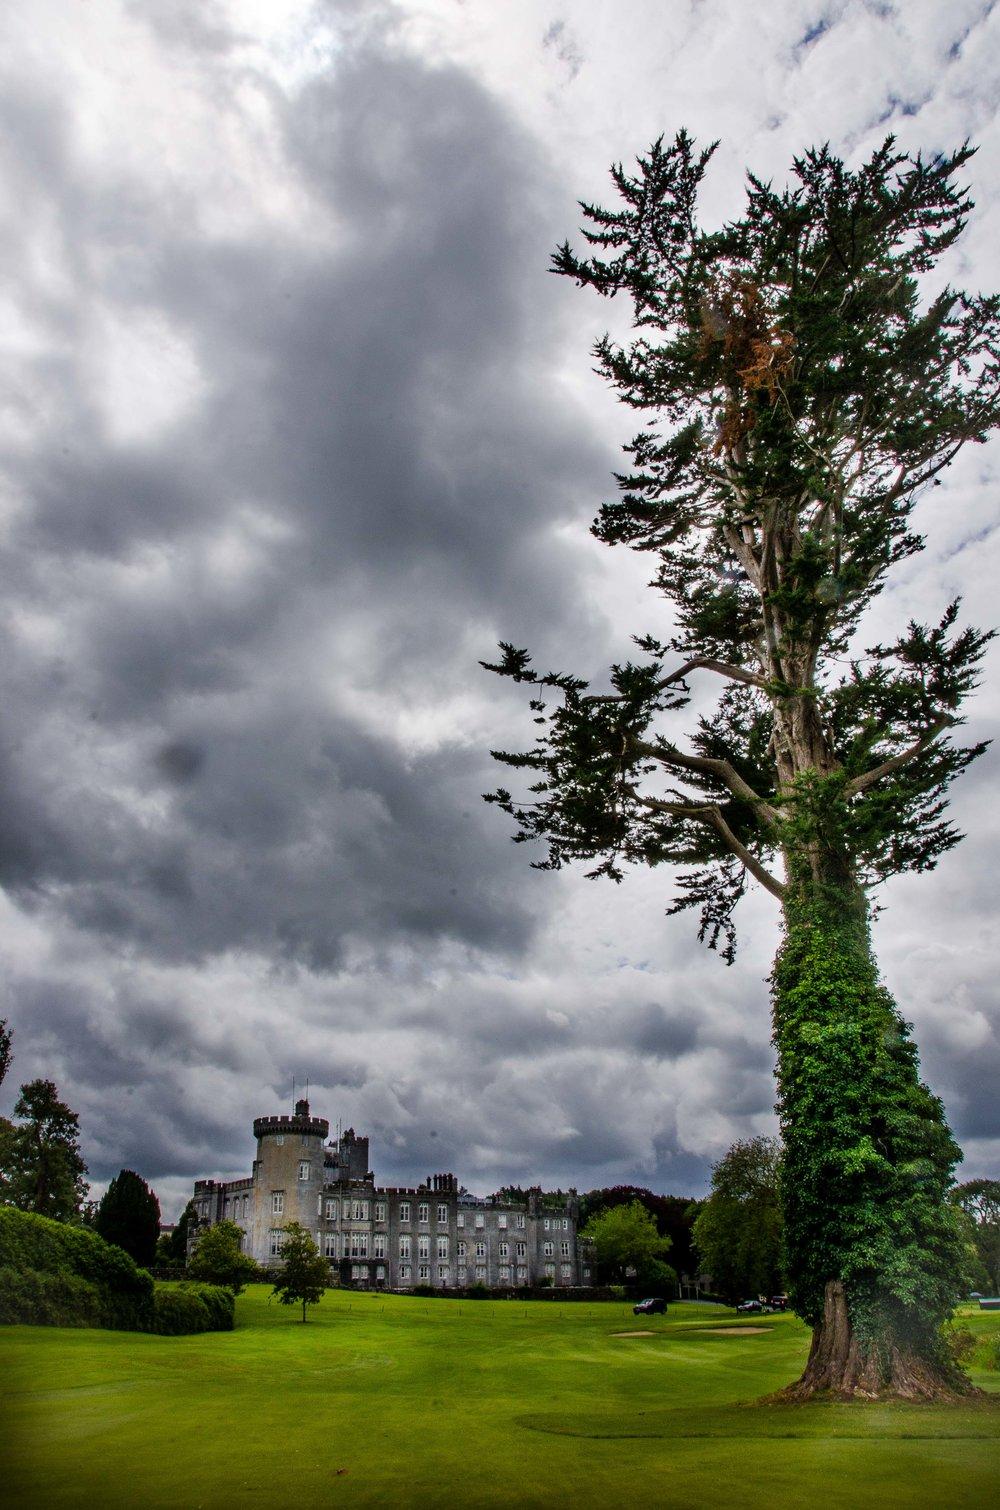 Dromoland Castle. County Clare, Ireland 2015